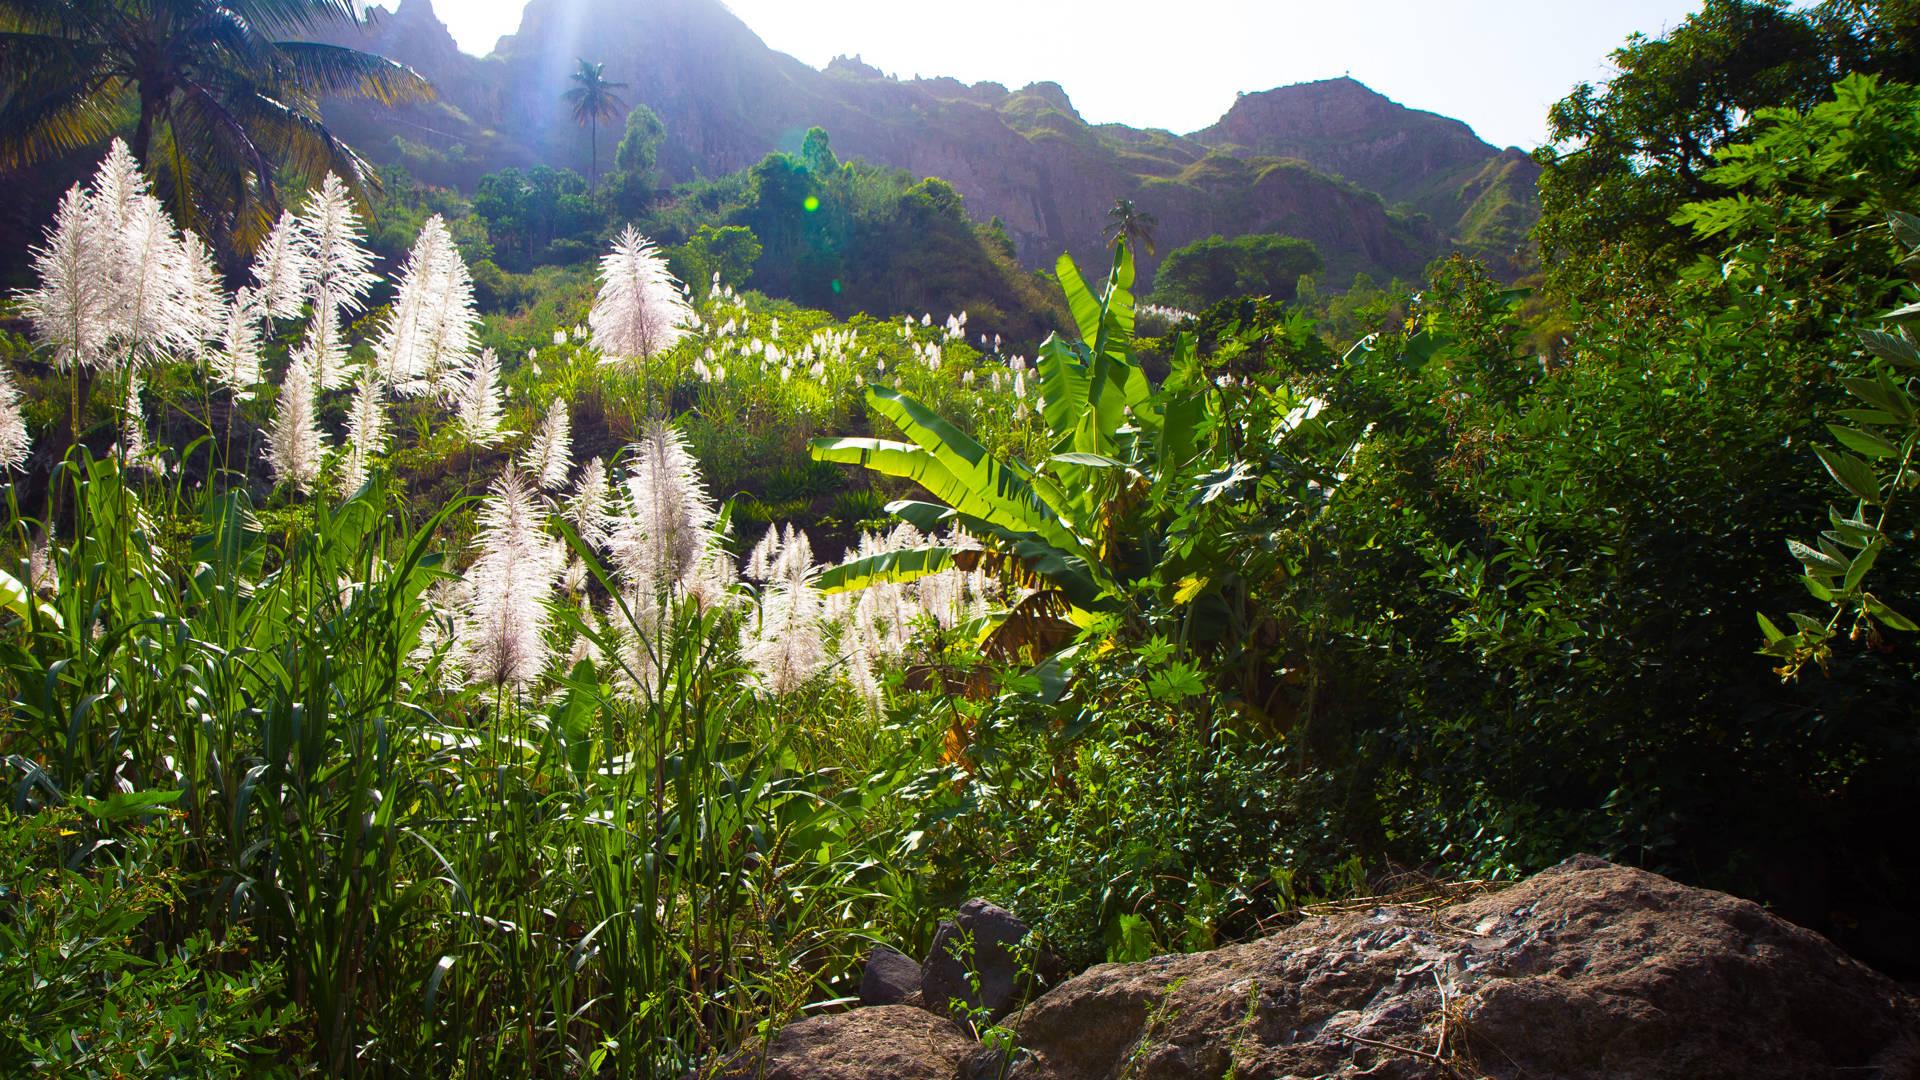 vakantie naar de groene kaap - Vakantie Kaapverdië gastblog Linde-Kee